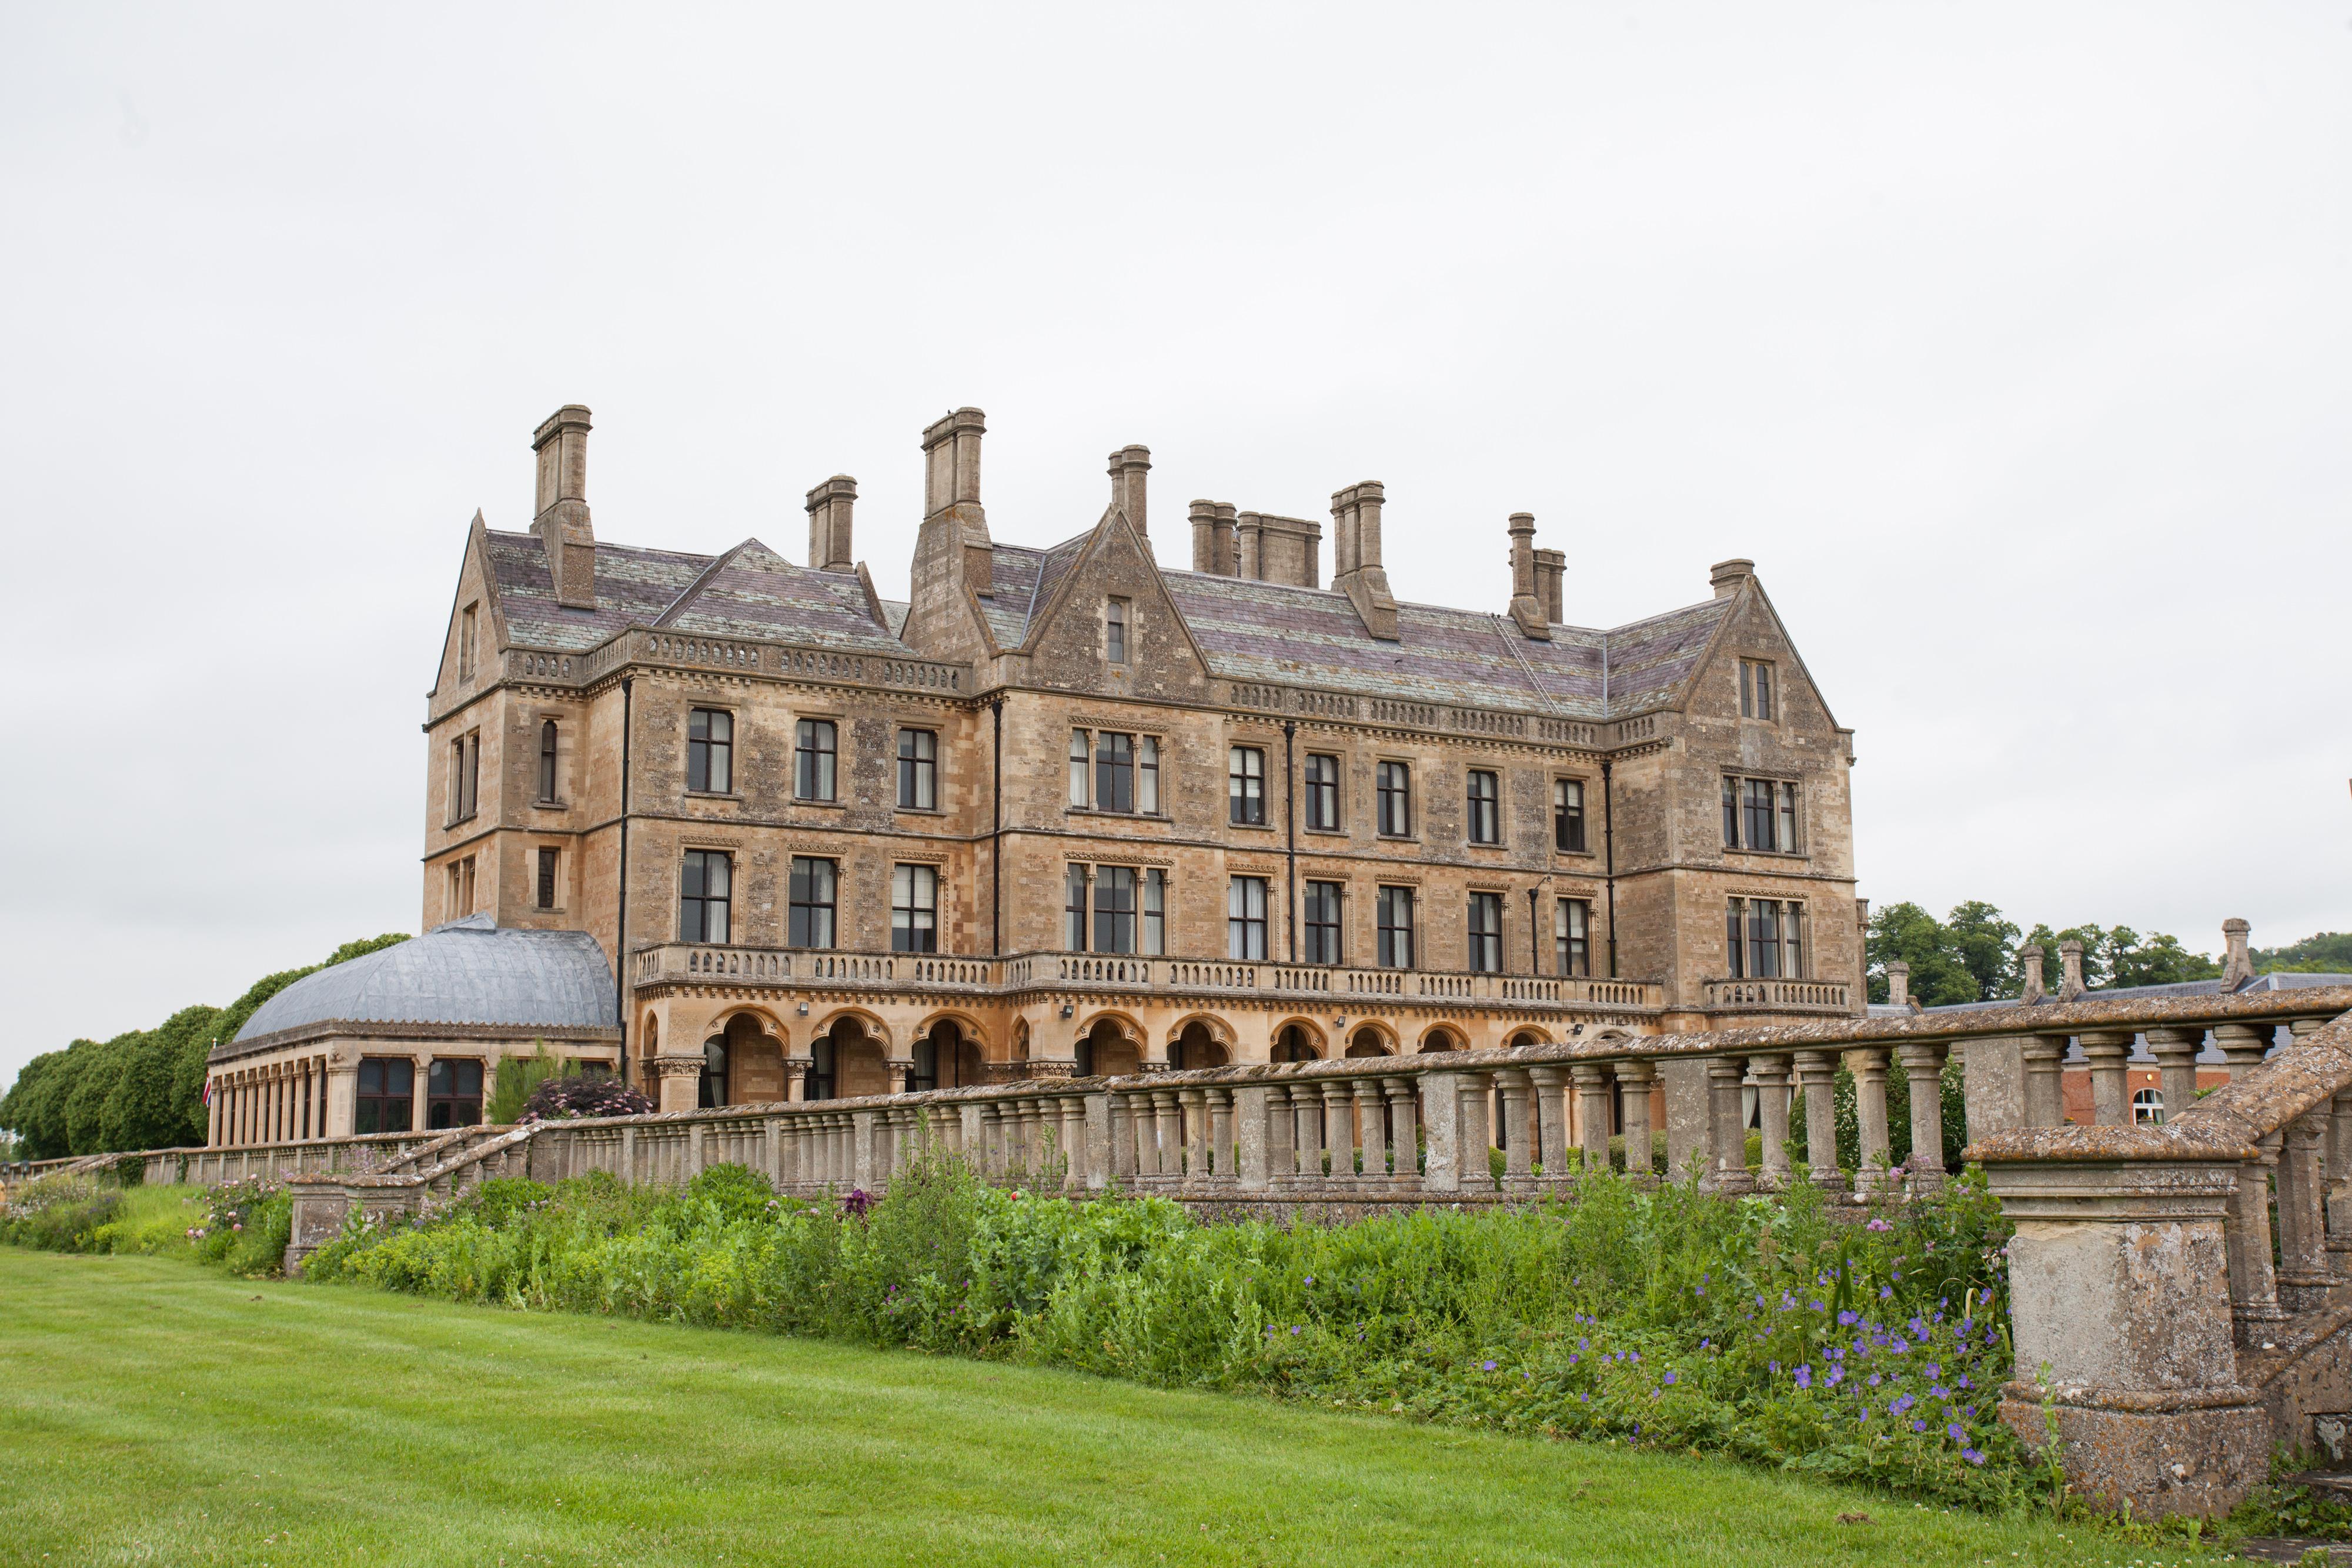 Mercure Warwickshire Walton Hall Hotel